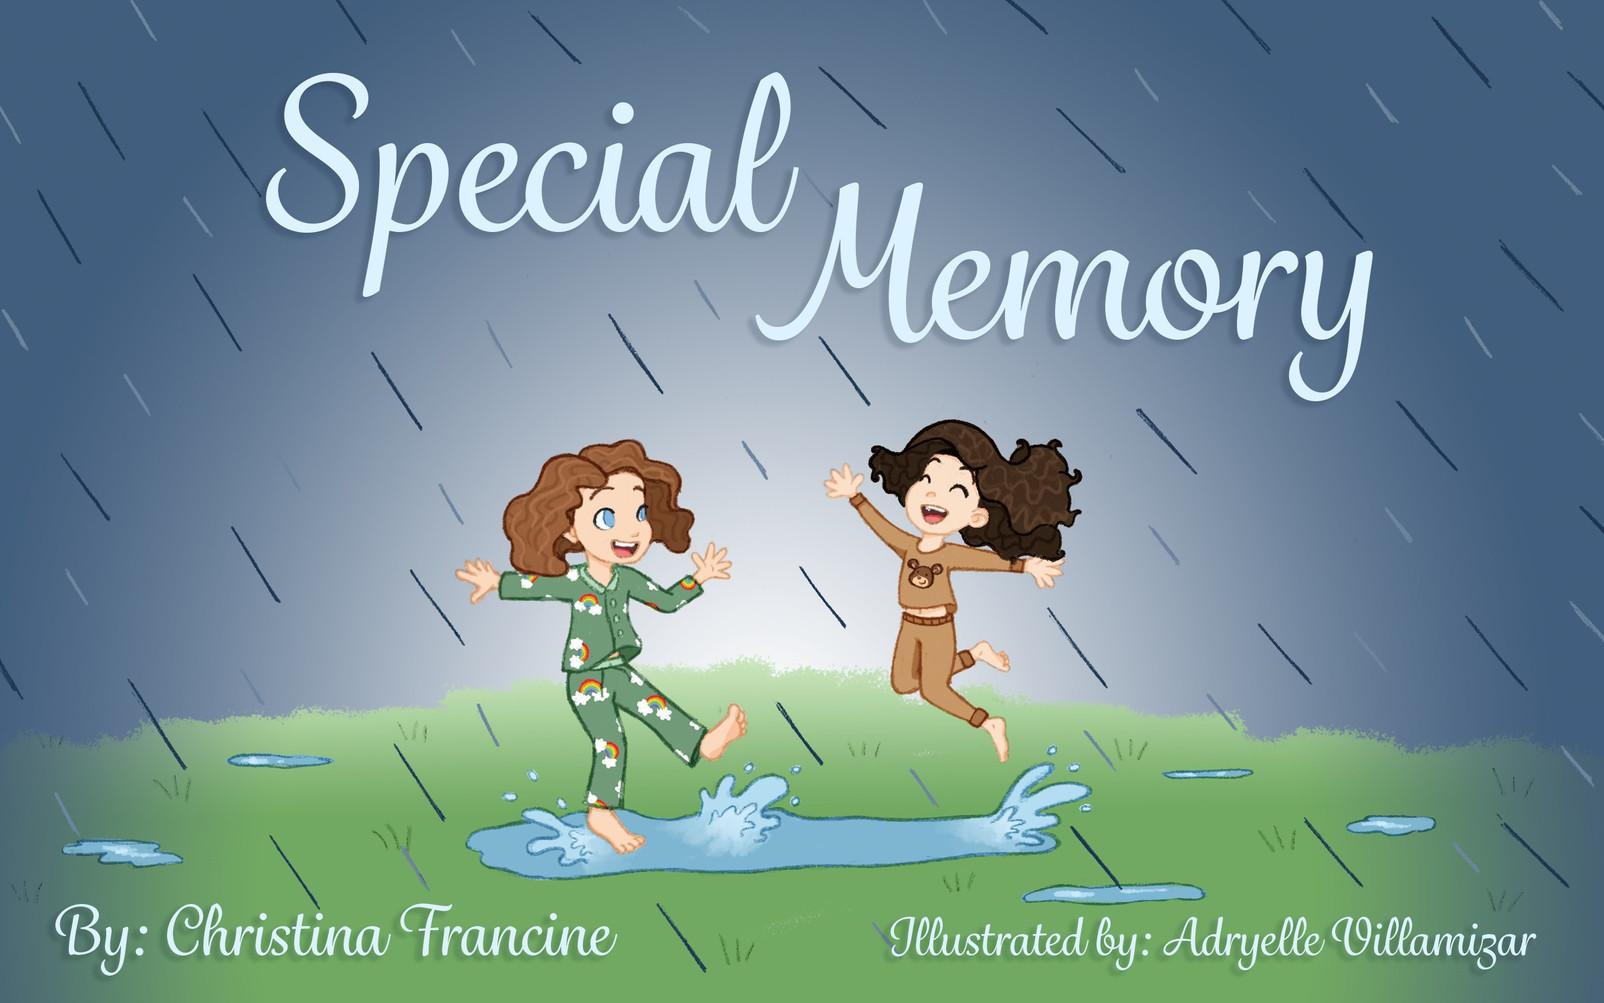 Special Memory